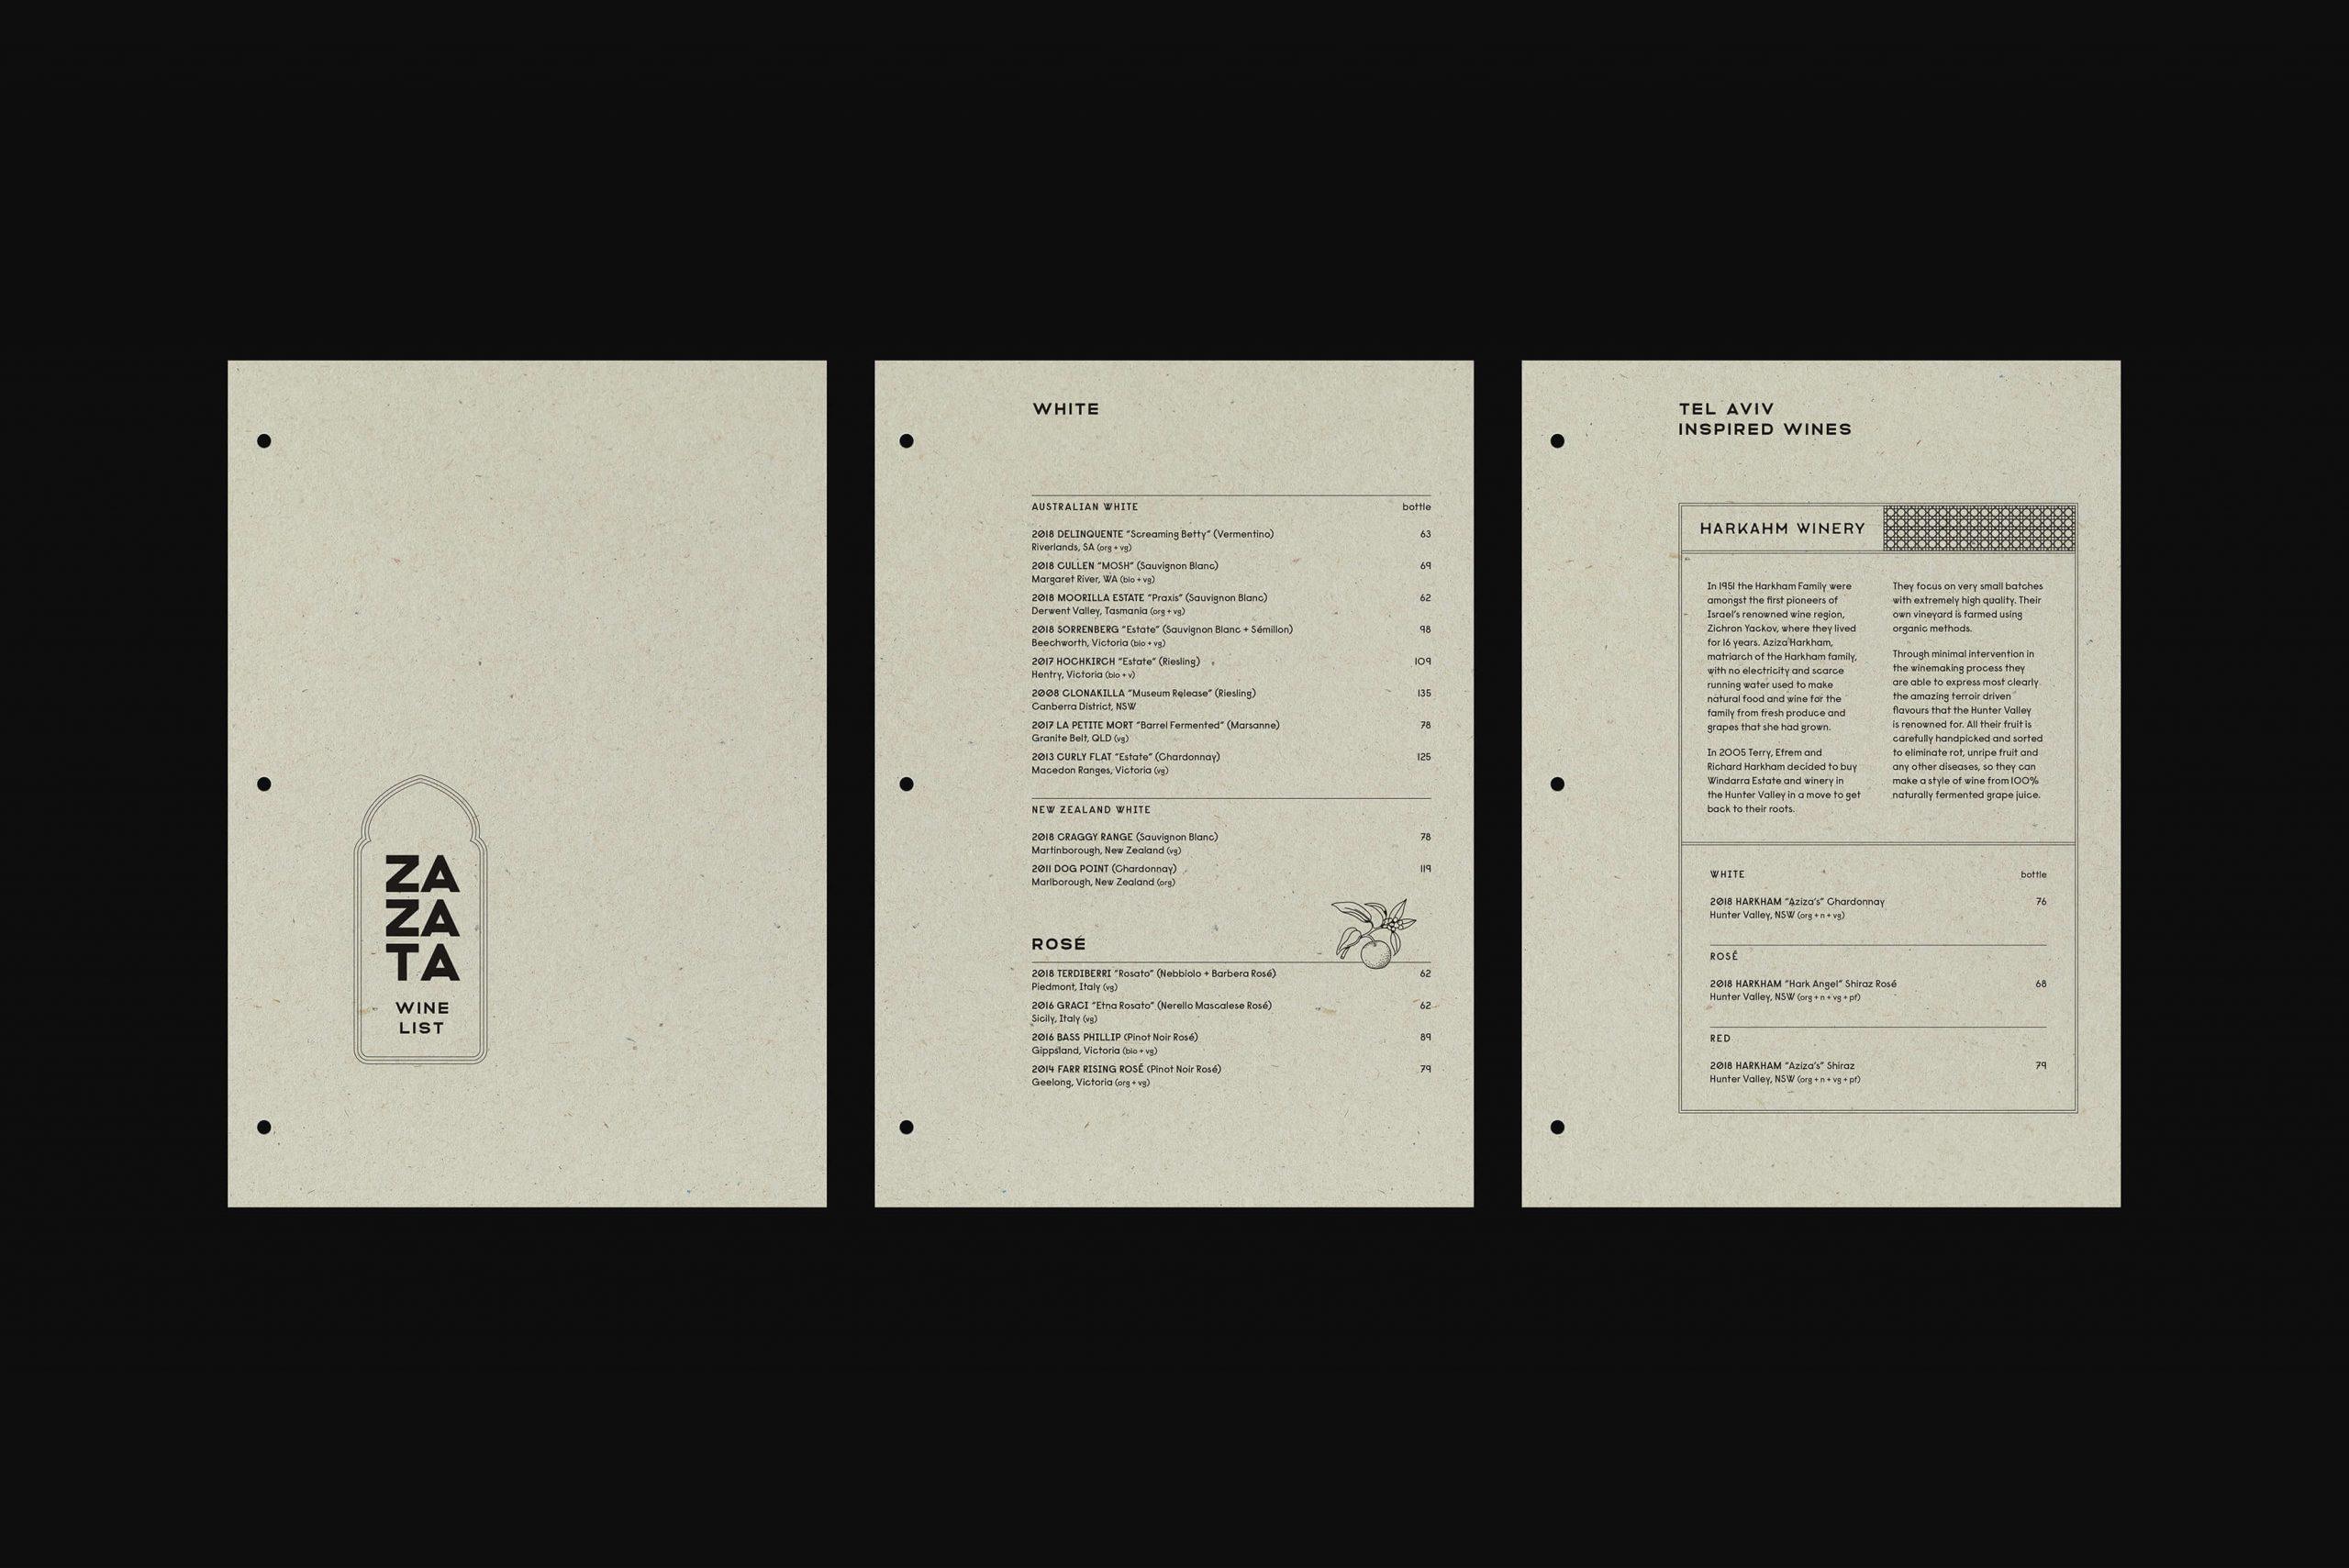 Ovolo Za Za Ta Hospitality Visual Identity - Menu design flat lays